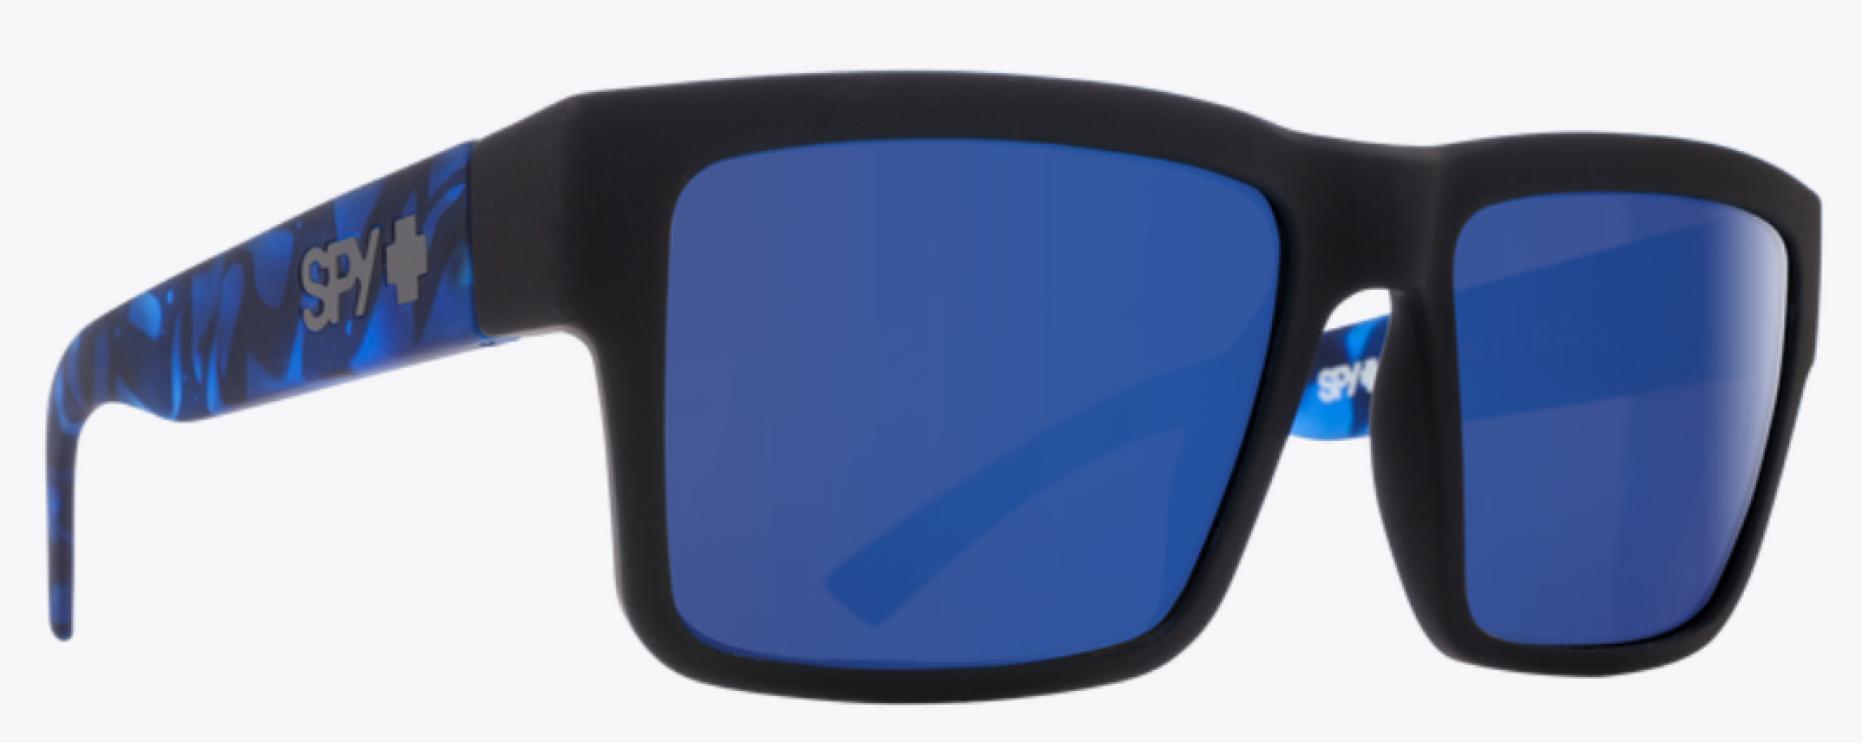 SPY MONTANA SFT MAT BLK BLUE